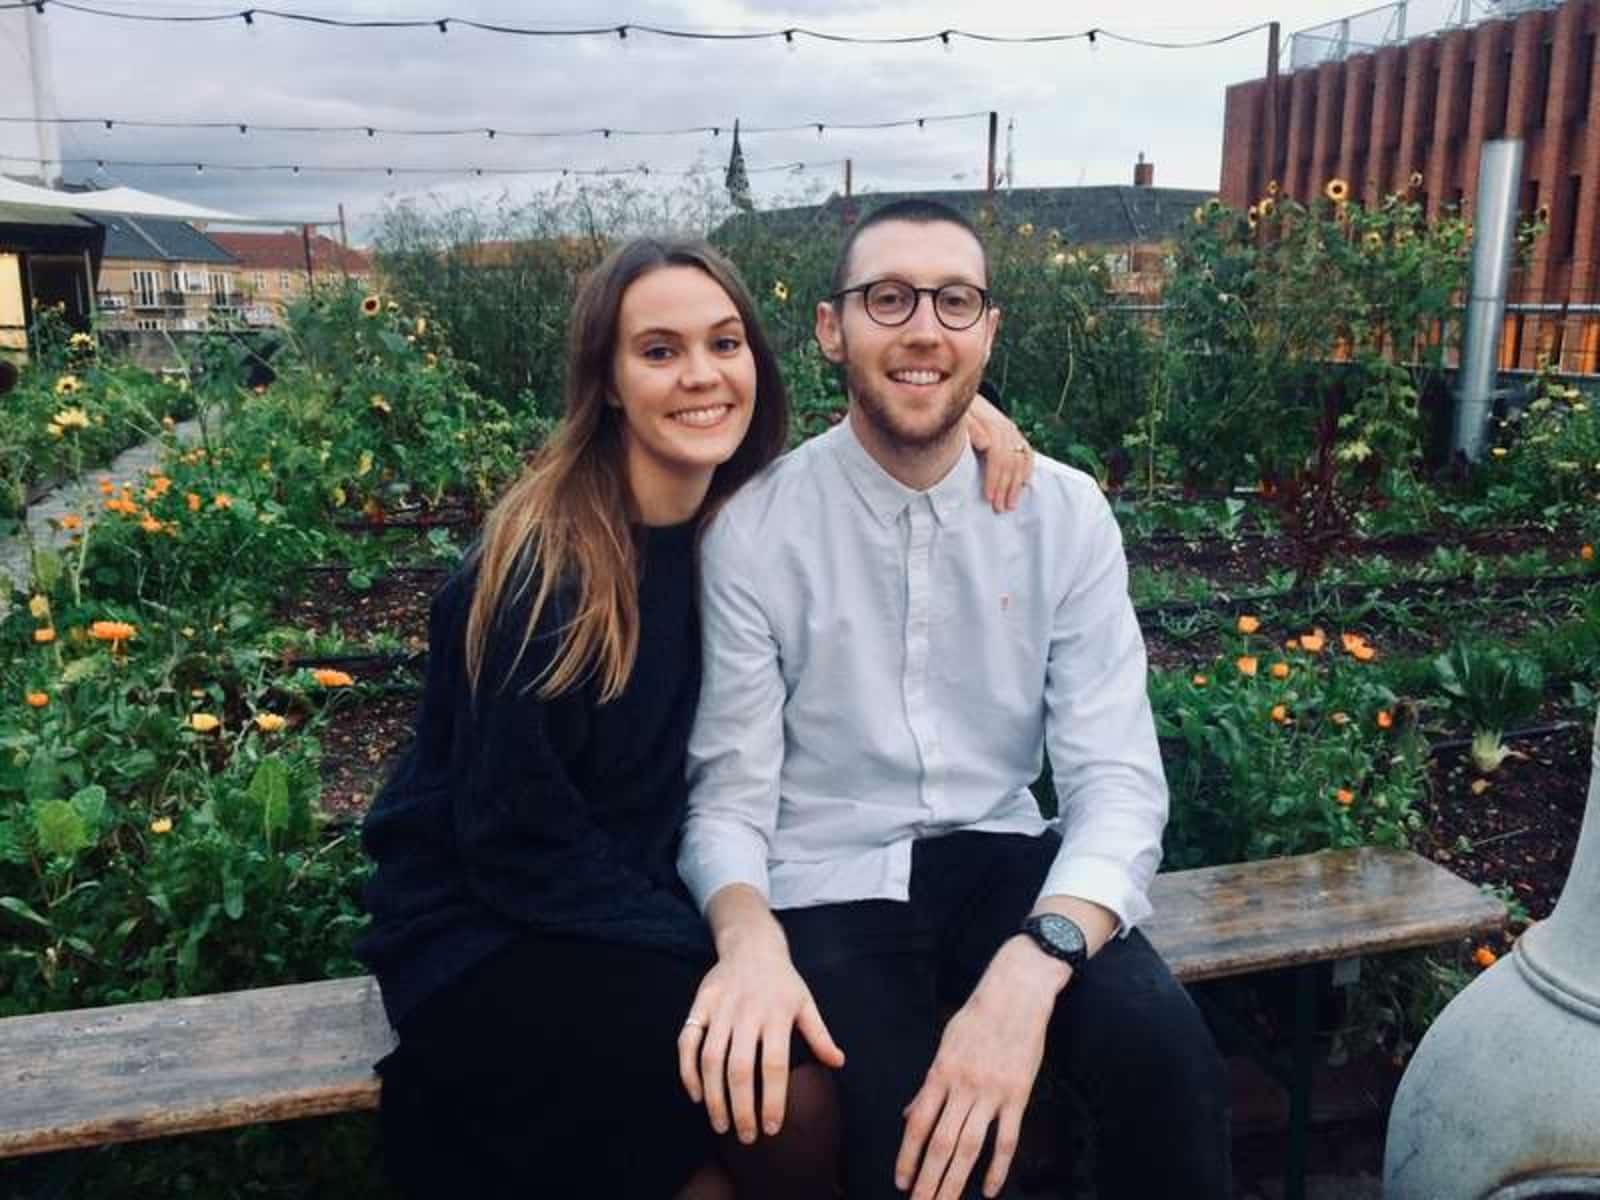 Alexander & Catherina from Copenhagen, Denmark